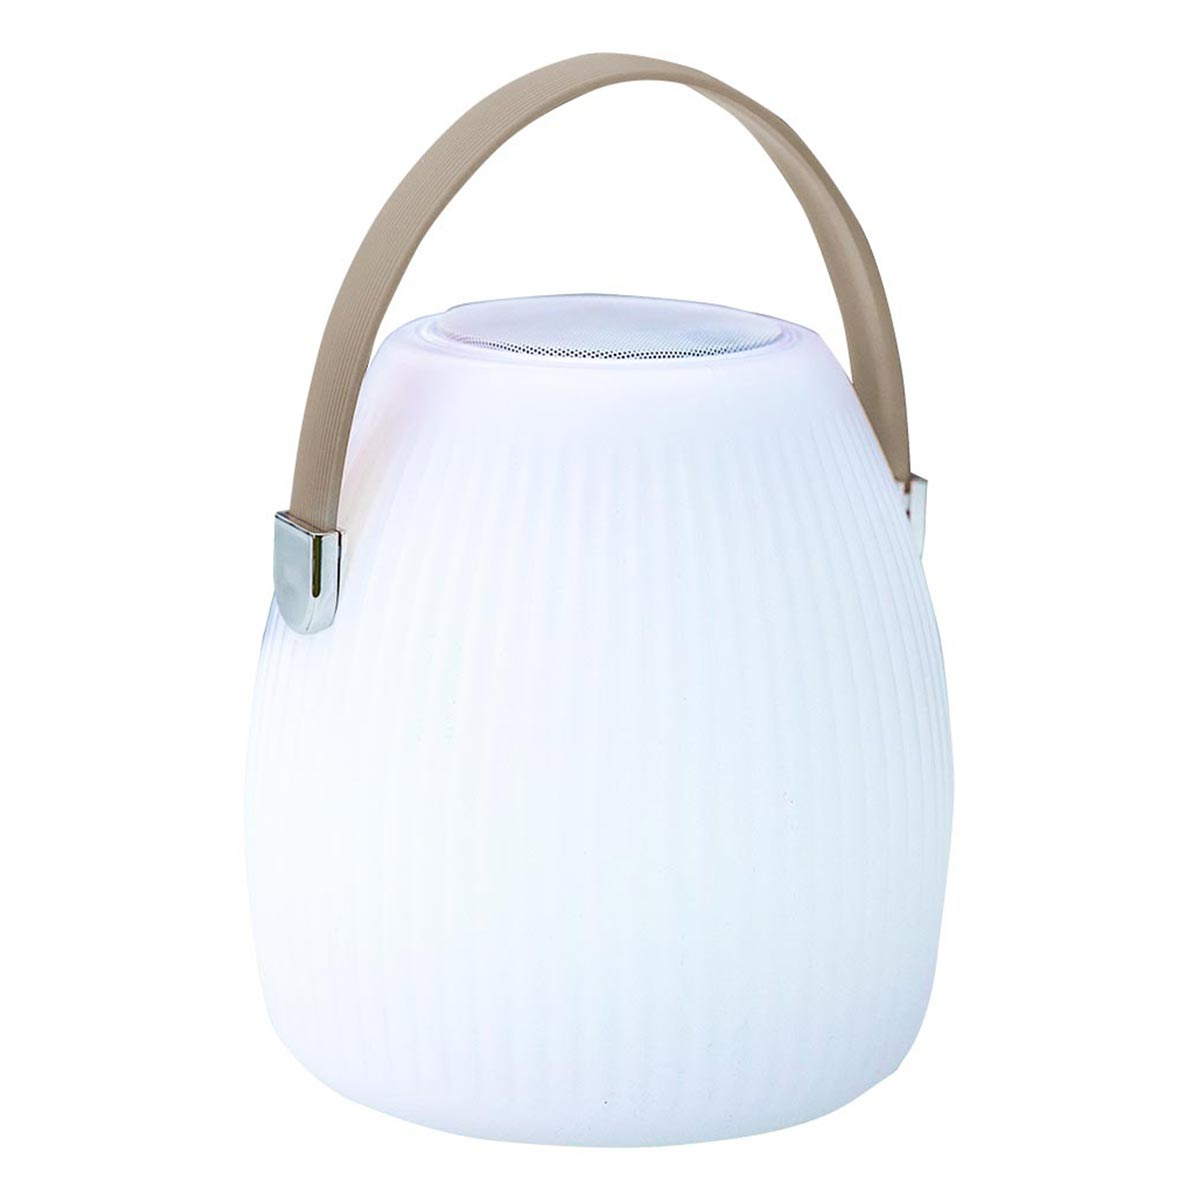 MINI MAY PLAY - Mini lampe enceinte plastique blanc H23cm